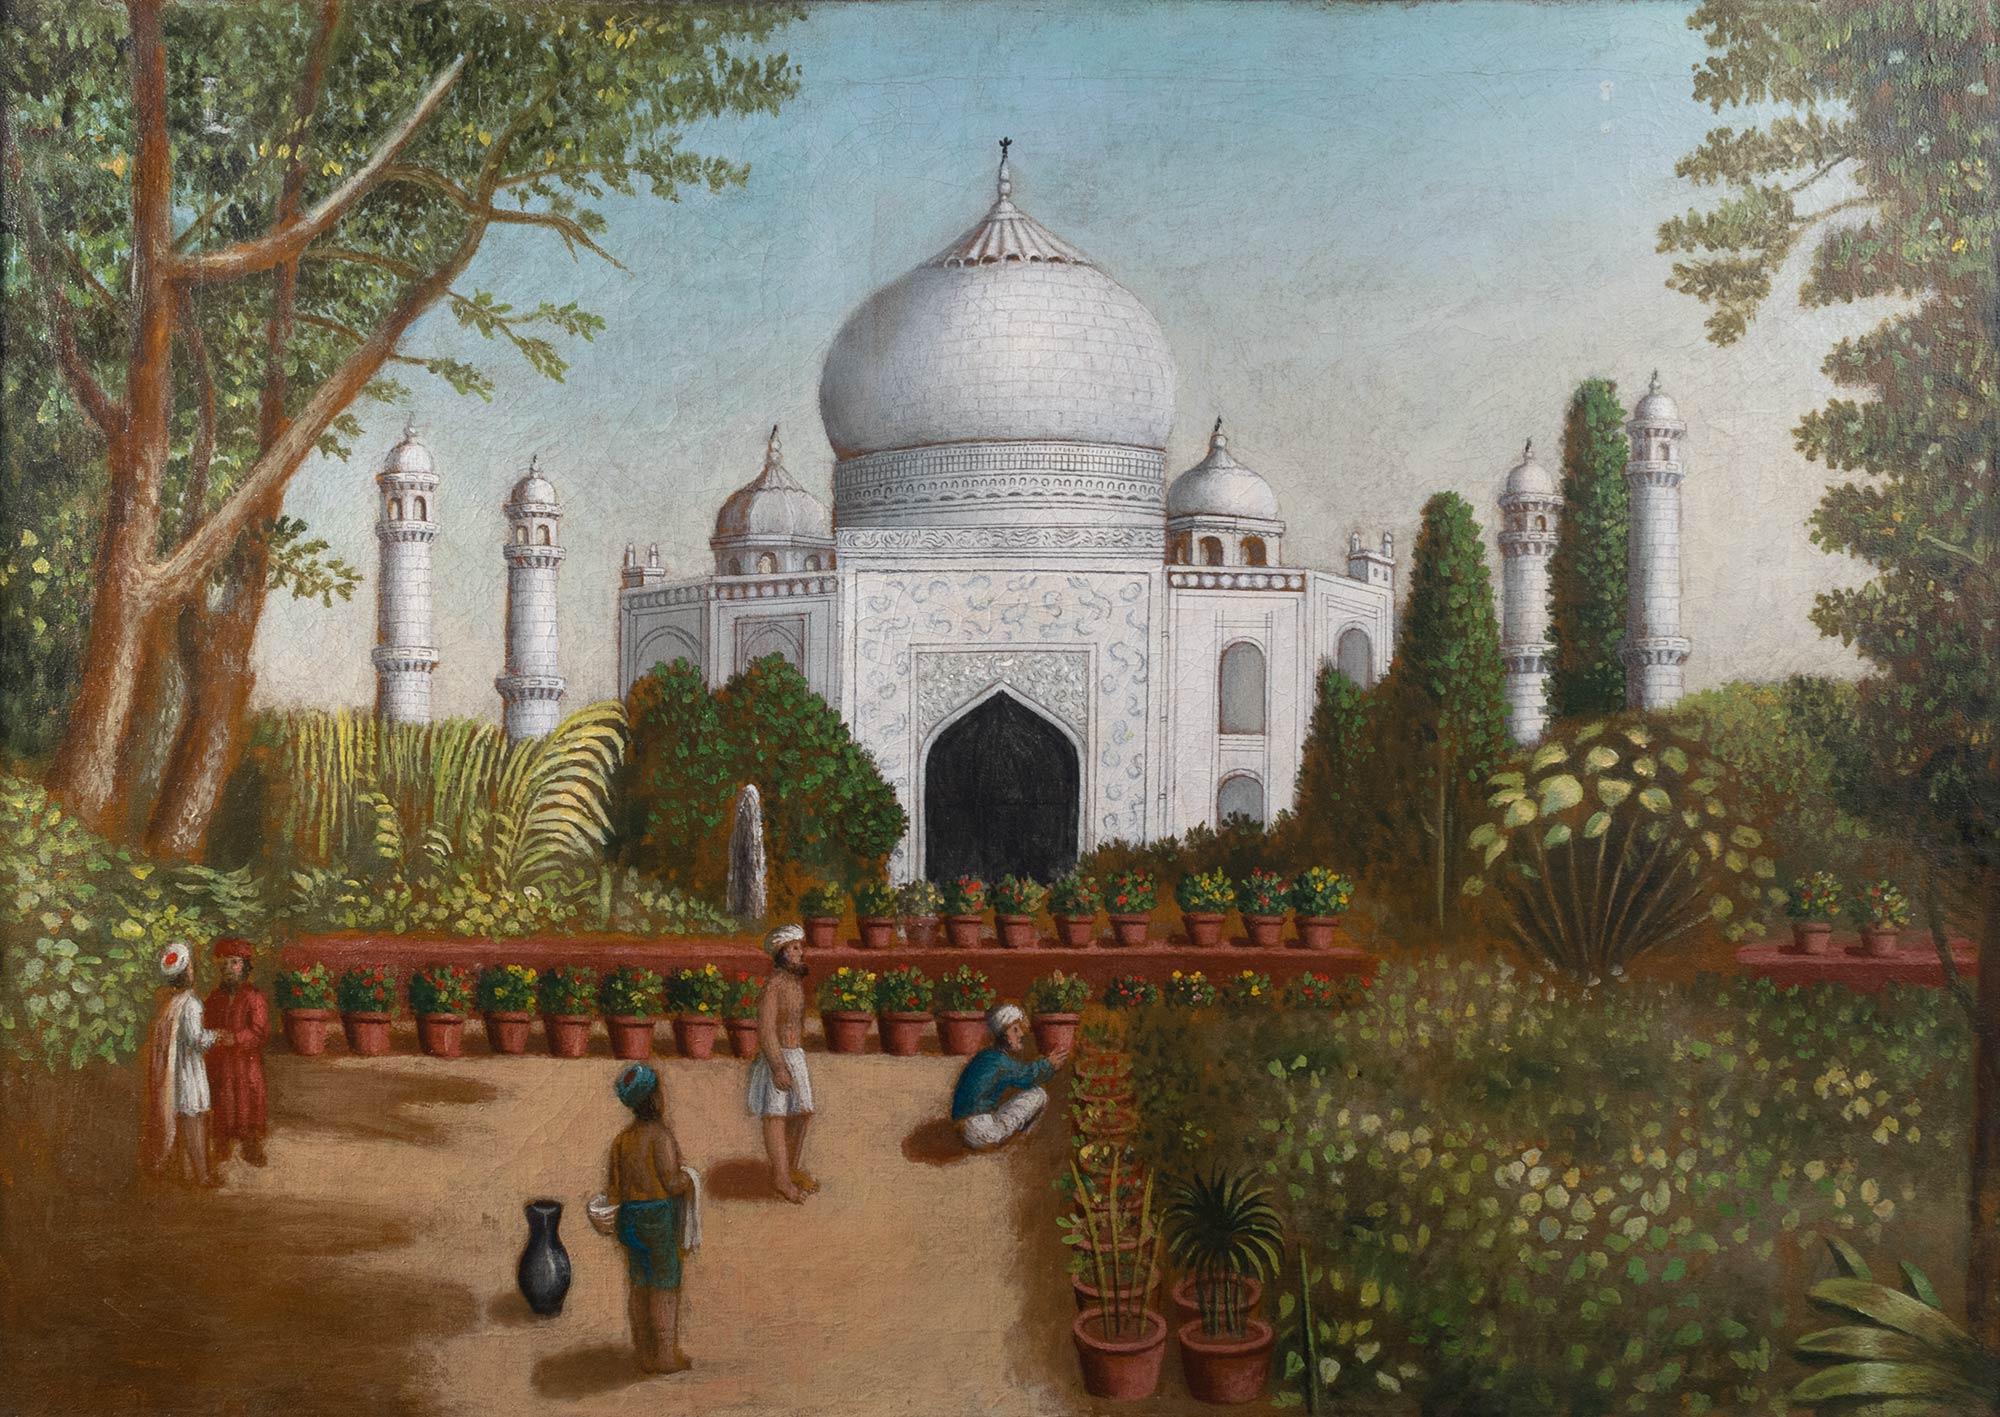 Erastus Salisbury Field, American, 1805–1900. The Taj Mahal, ca. 1850. Oil on canvas, 24 ¼ x 34 1/8 in. Gift of Edgar William and Bernice Chrysler Garbisch, 1968.202